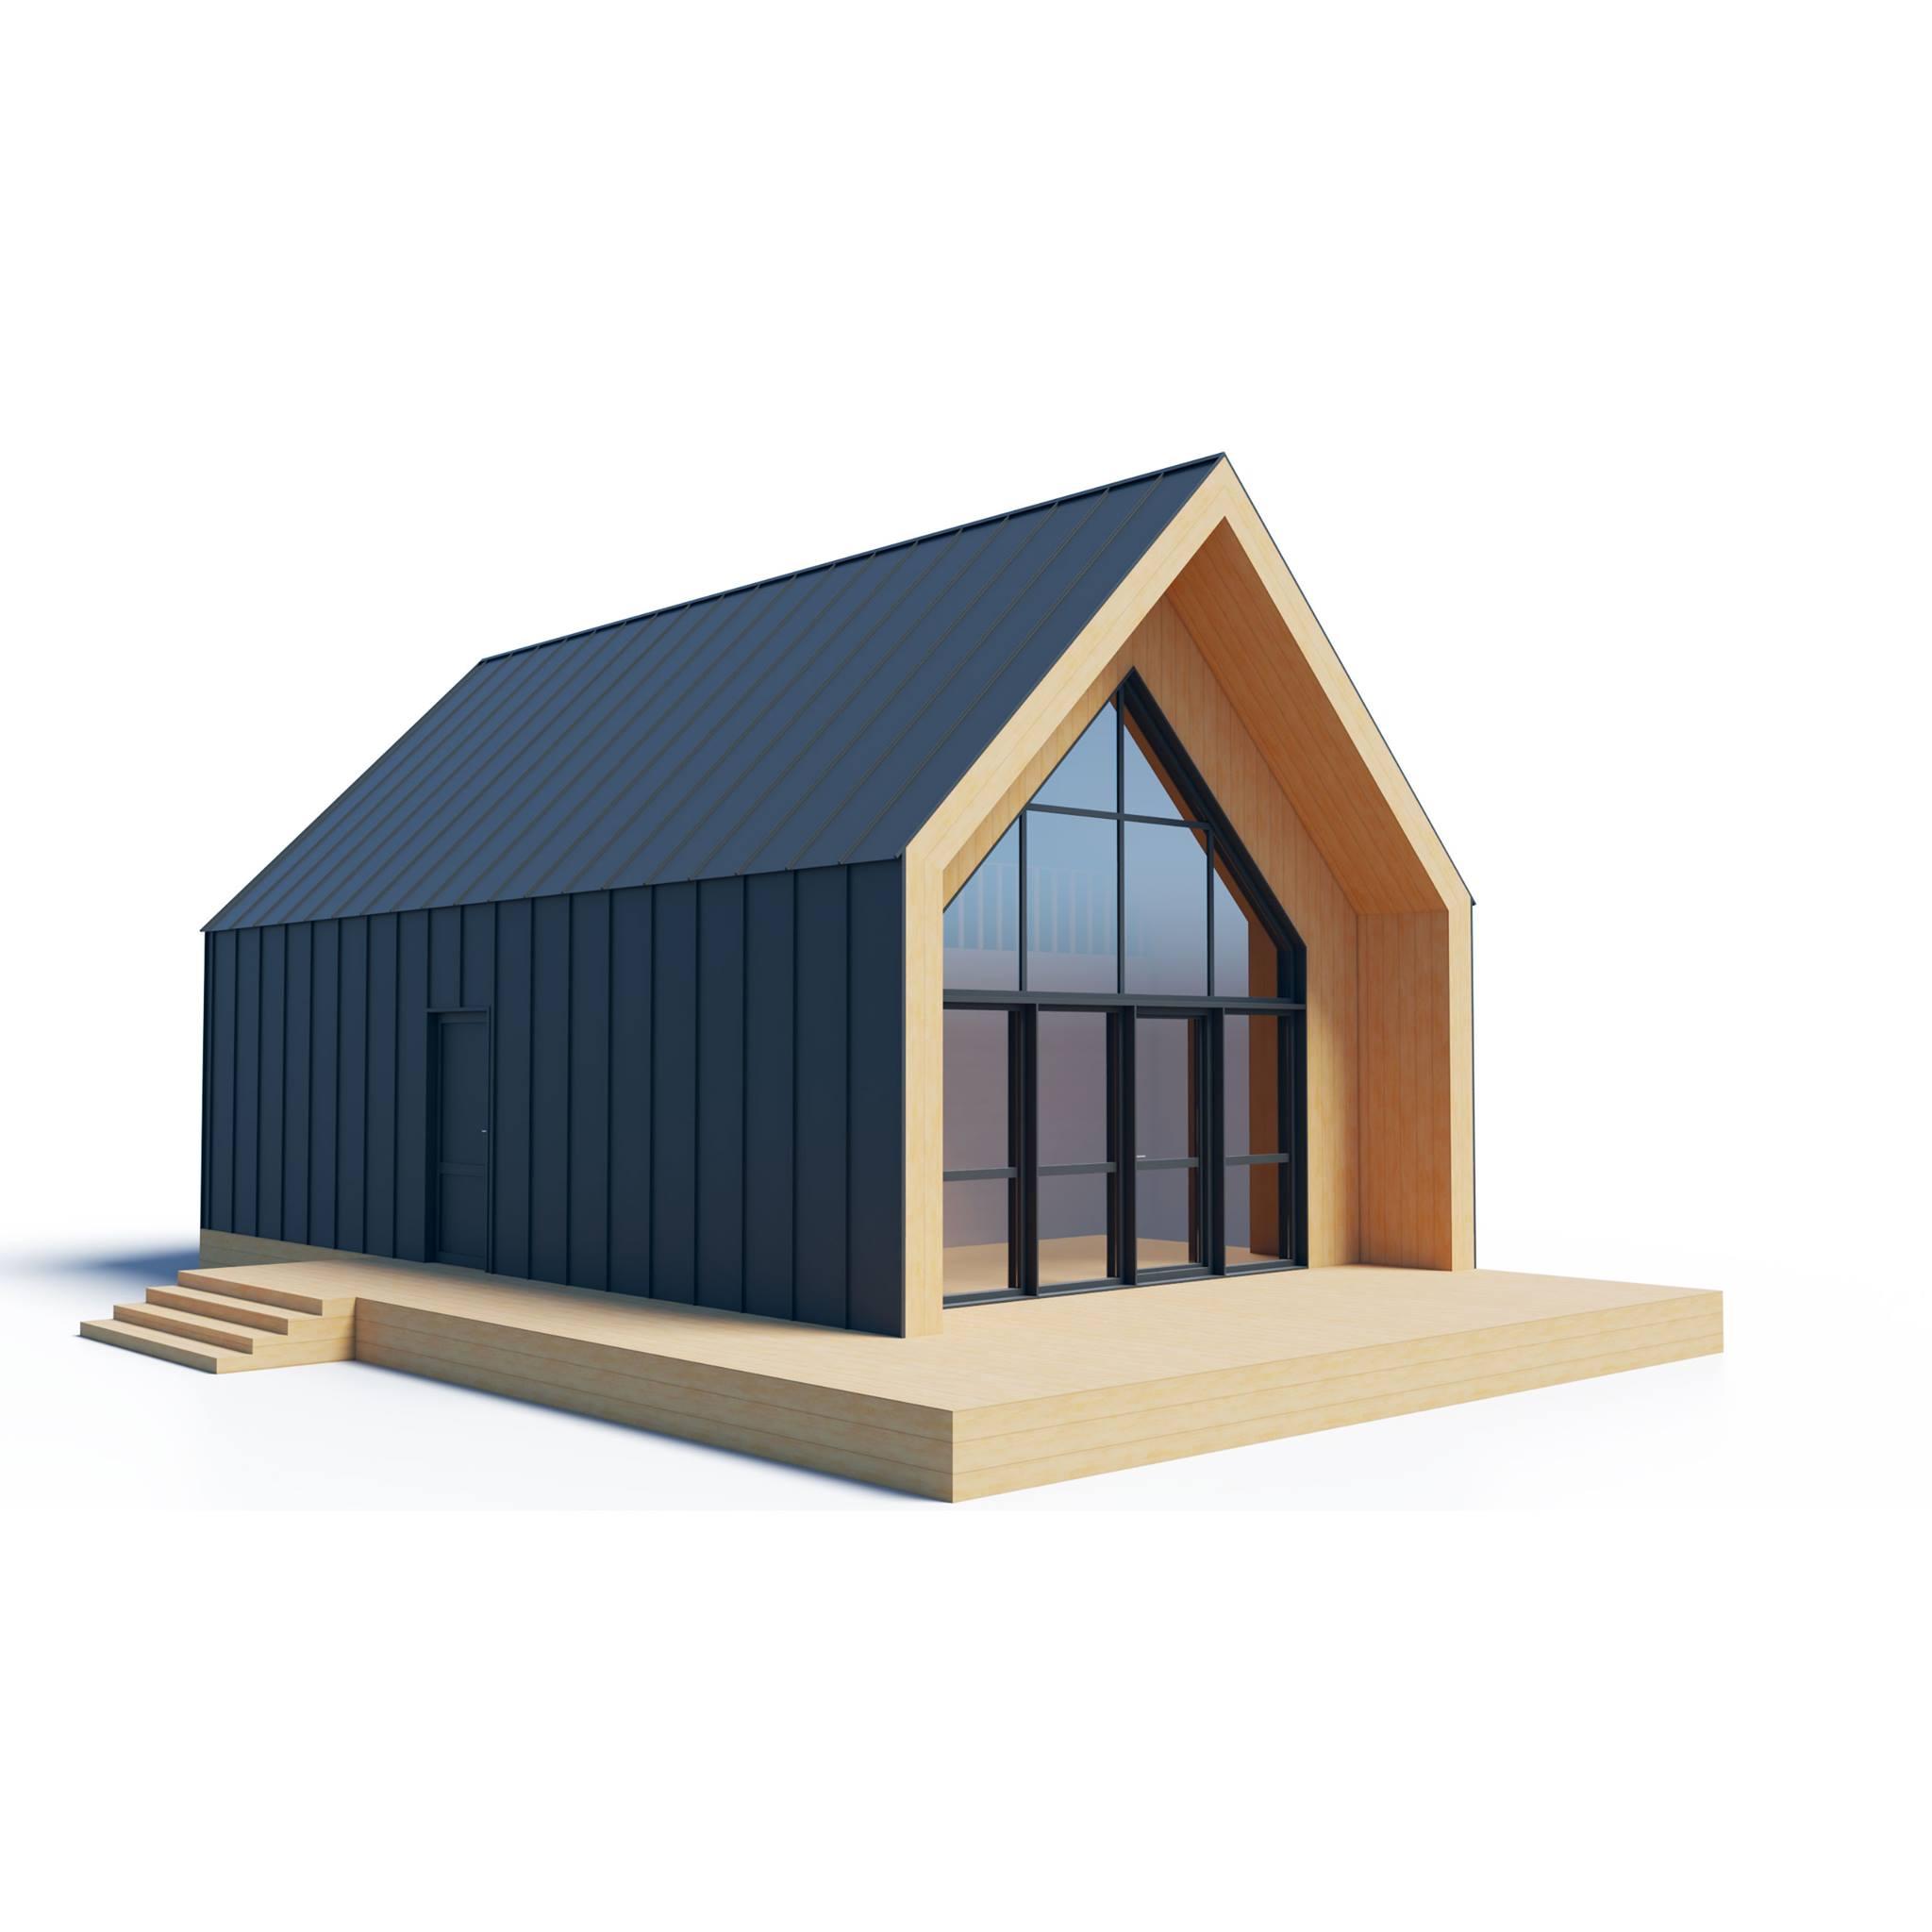 Grange morderne structure bois 60 M² + Meza 001 (9)